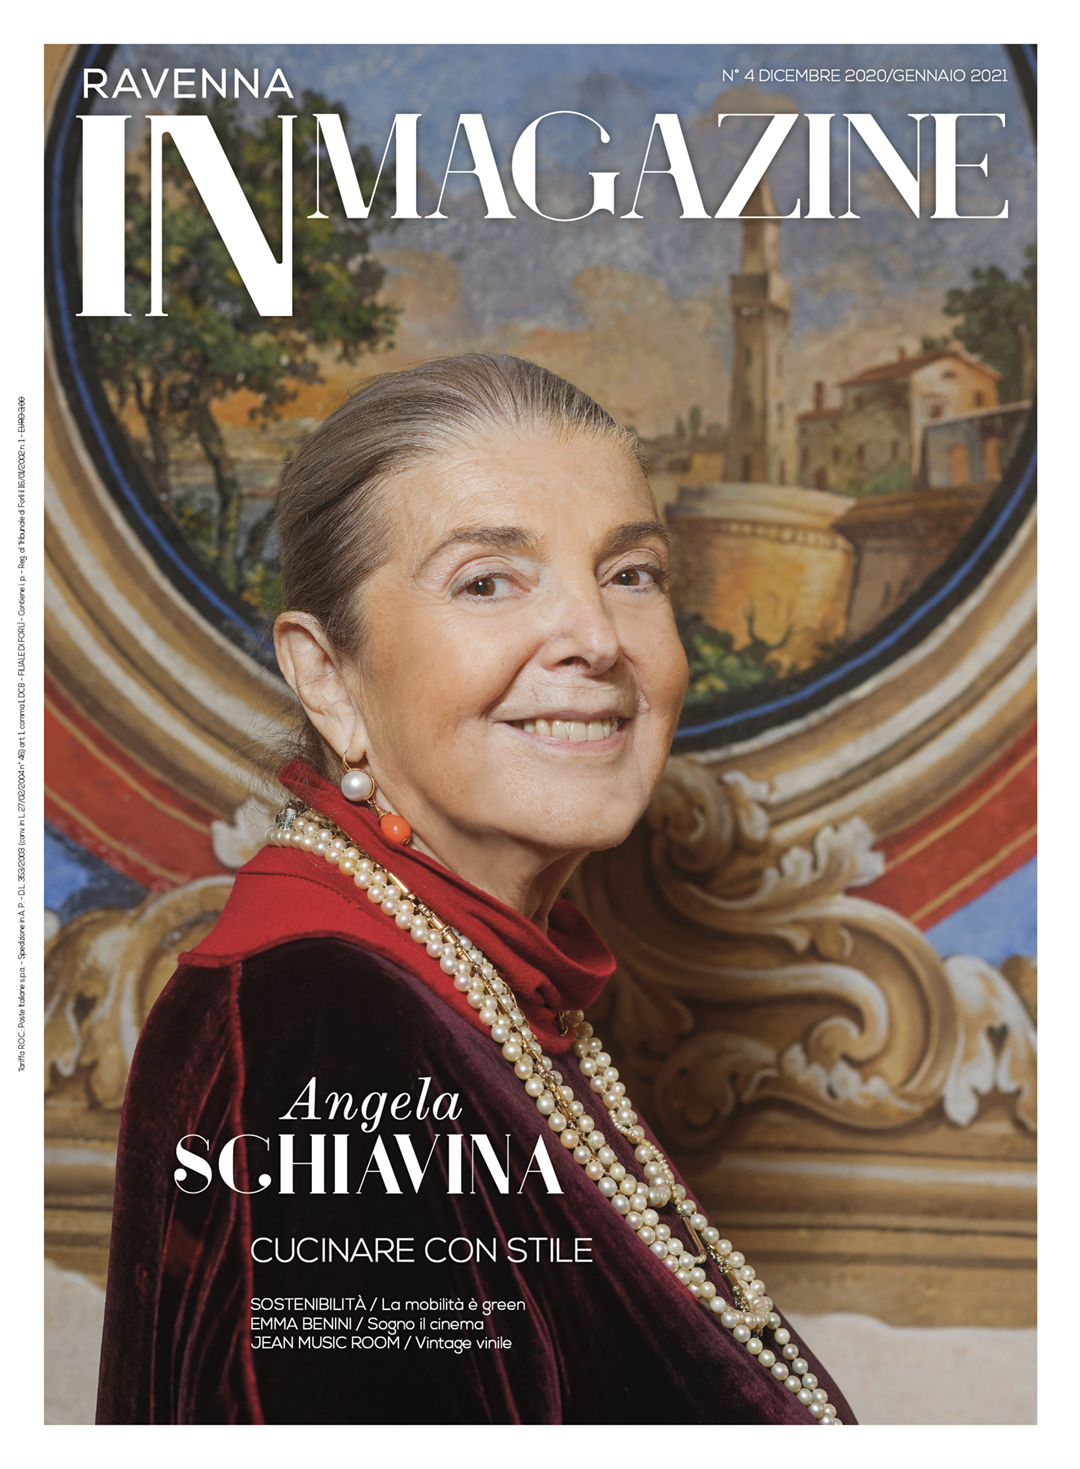 Angela Schiavina in copertina su Ravenna IN Magazine n. 4/2020